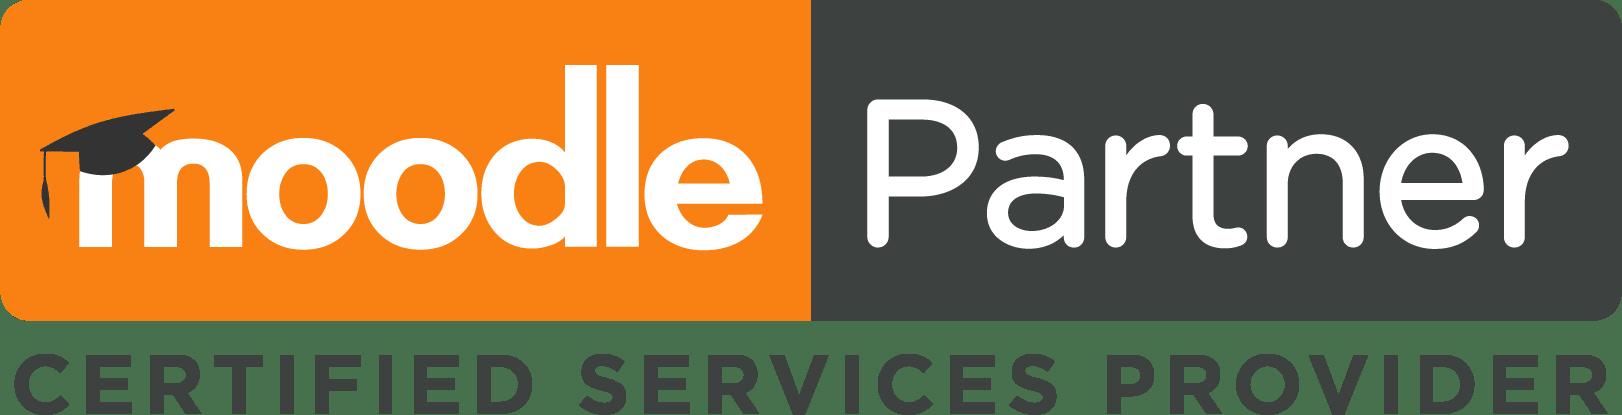 Moodle Partner - Certified services provider